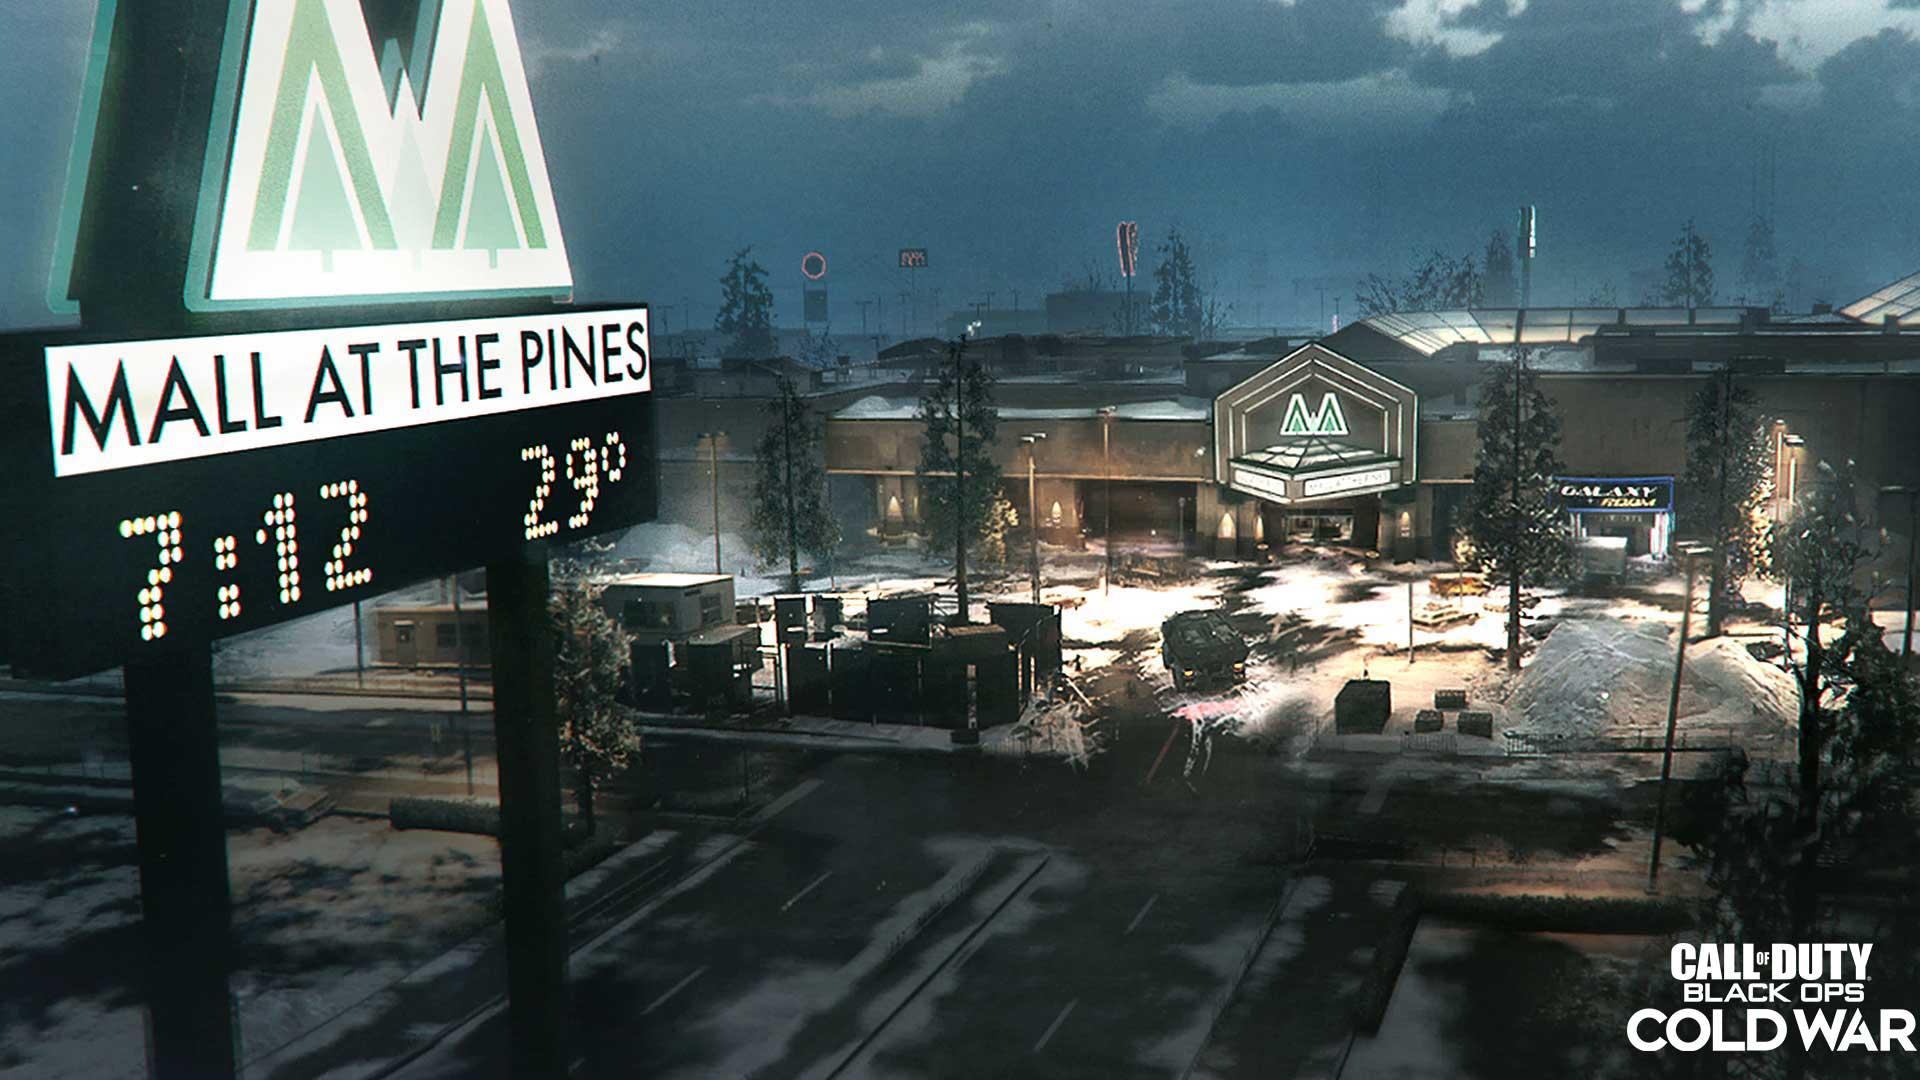 Screenhsot des Spiels Call of Duty: Black Ops Cold War Saison 1 zeigt die neue Karte Mall at the Pines